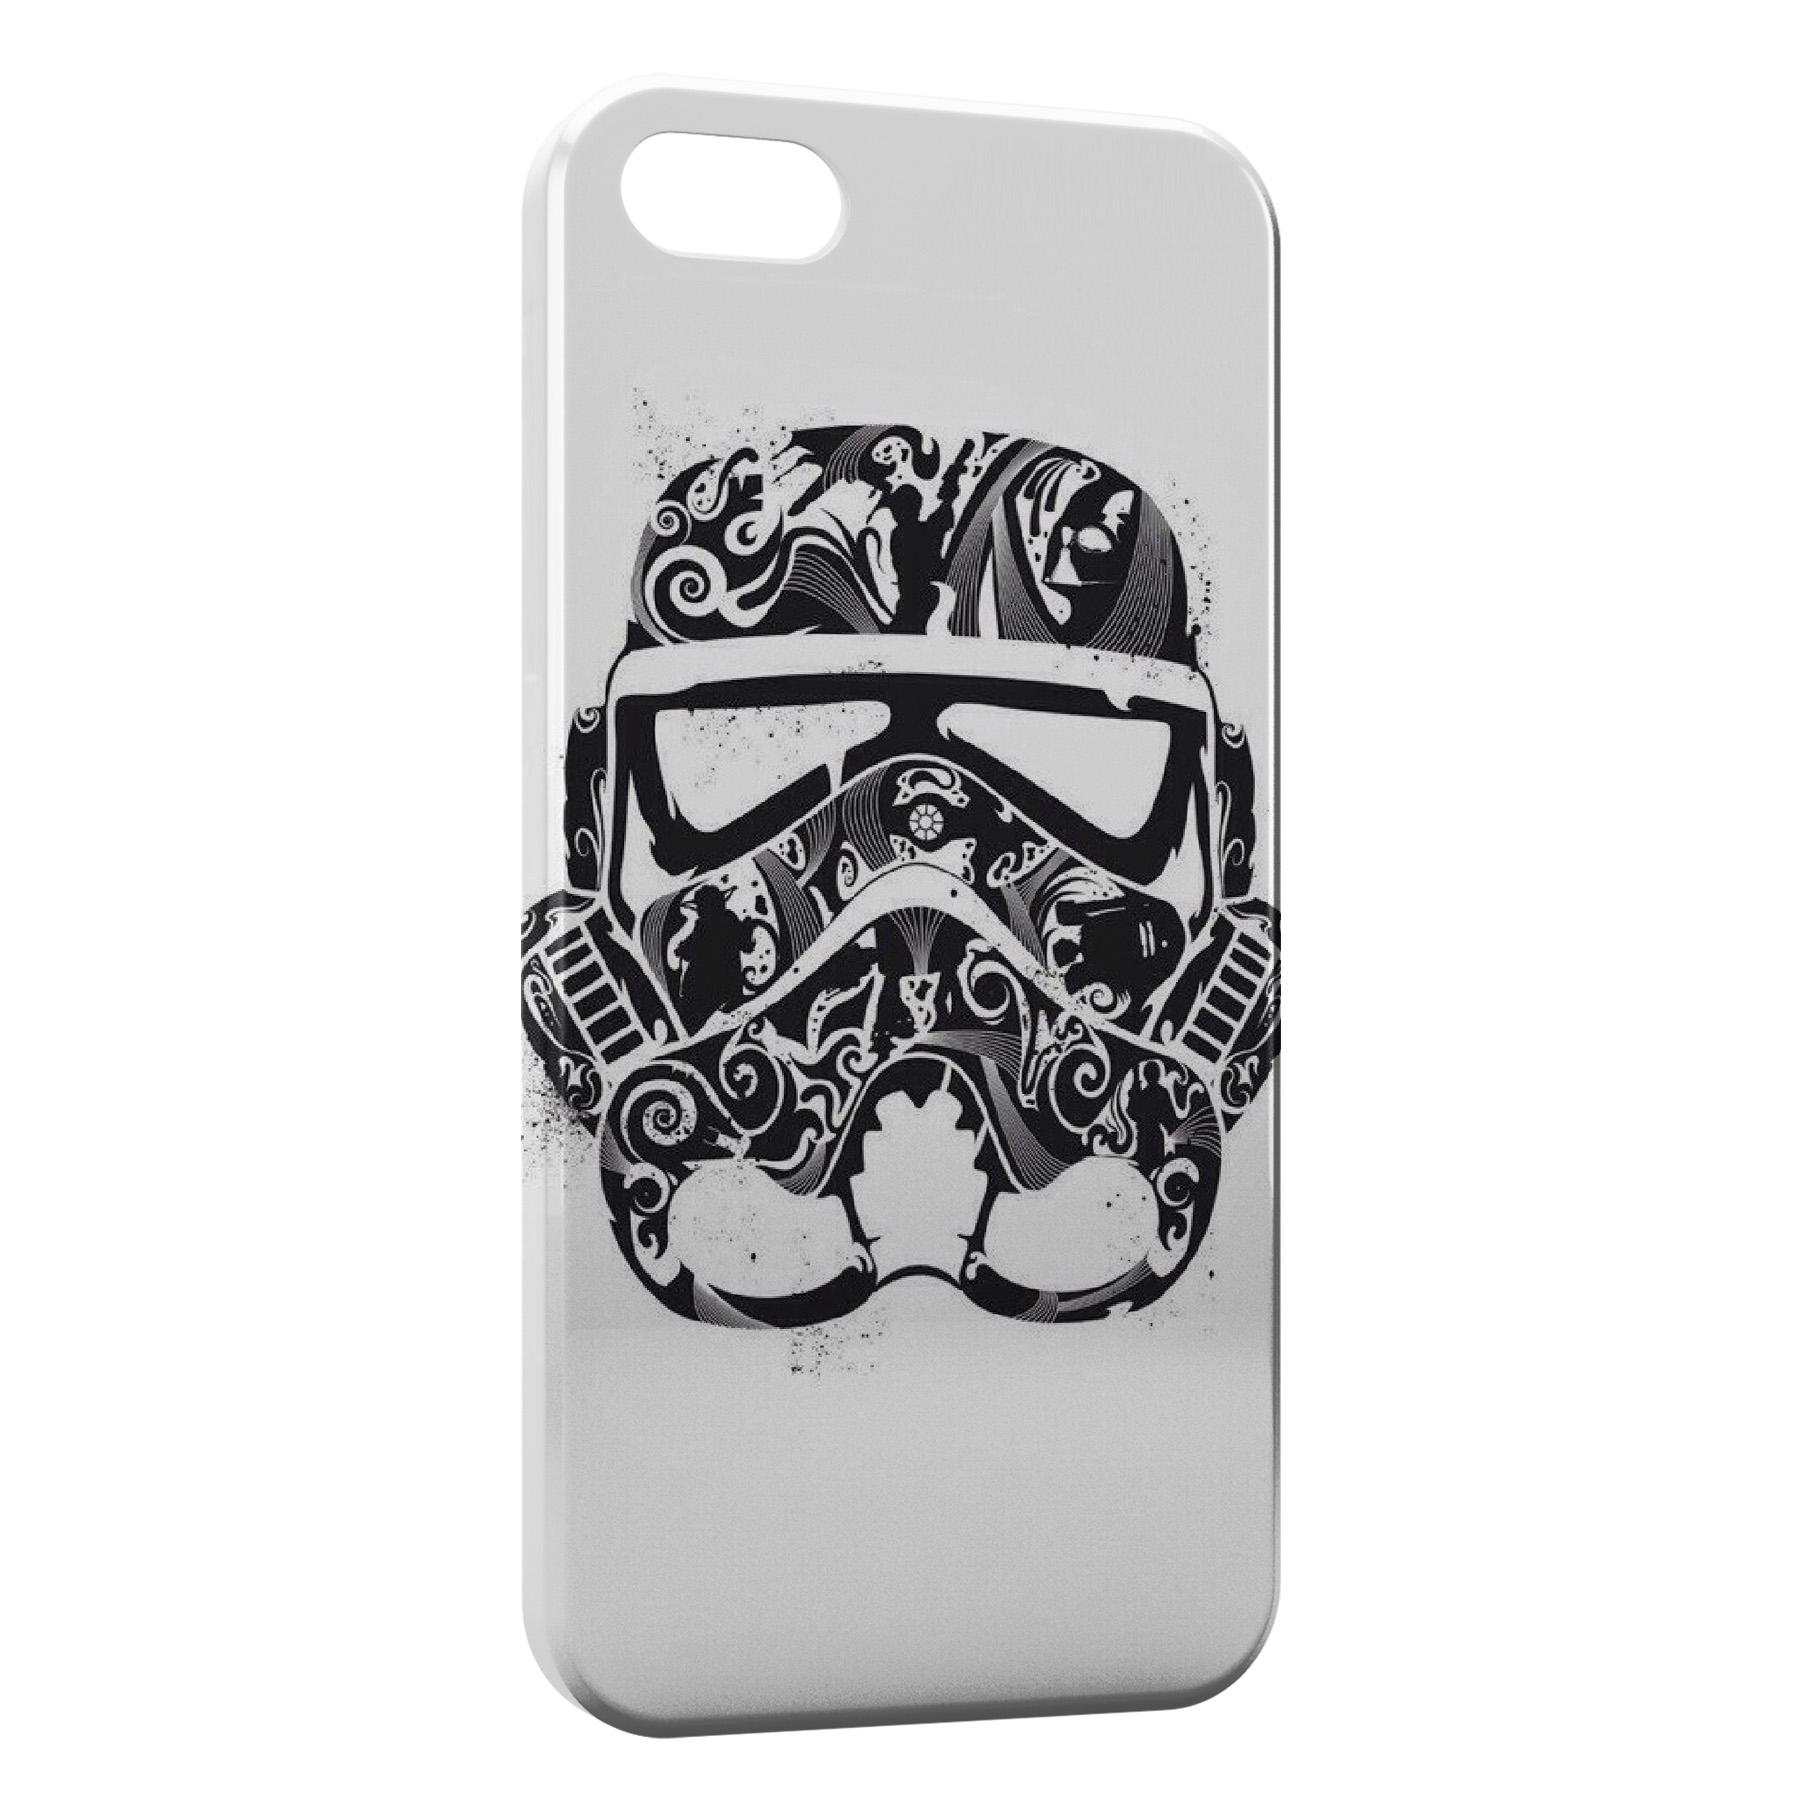 Coque iPhone 7 7 Plus Stormtrooper Star Wars